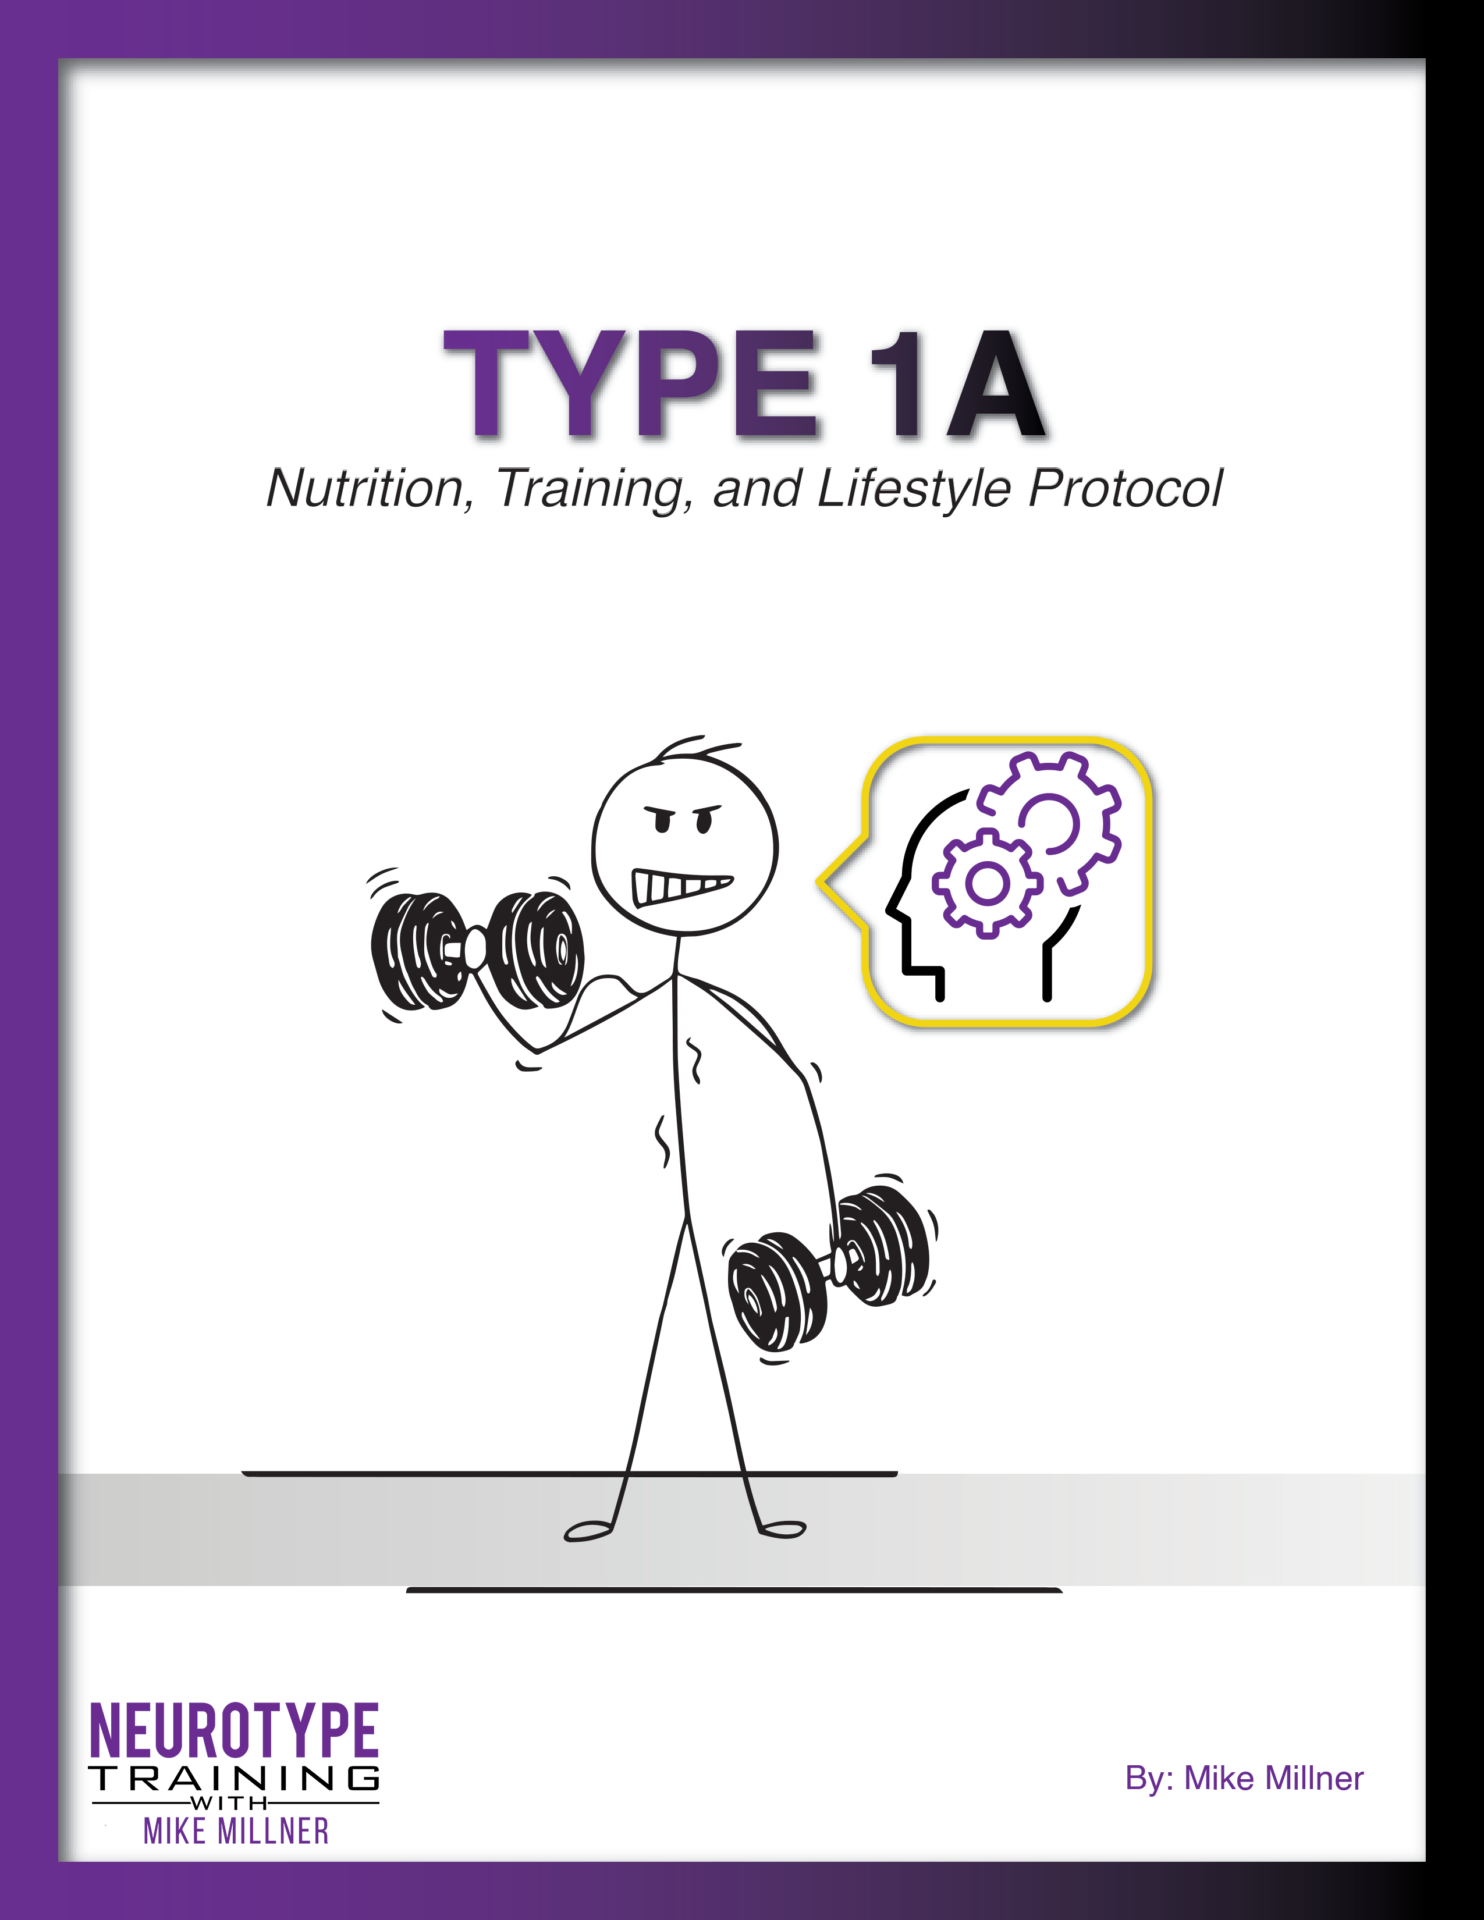 Neurotype training success stories